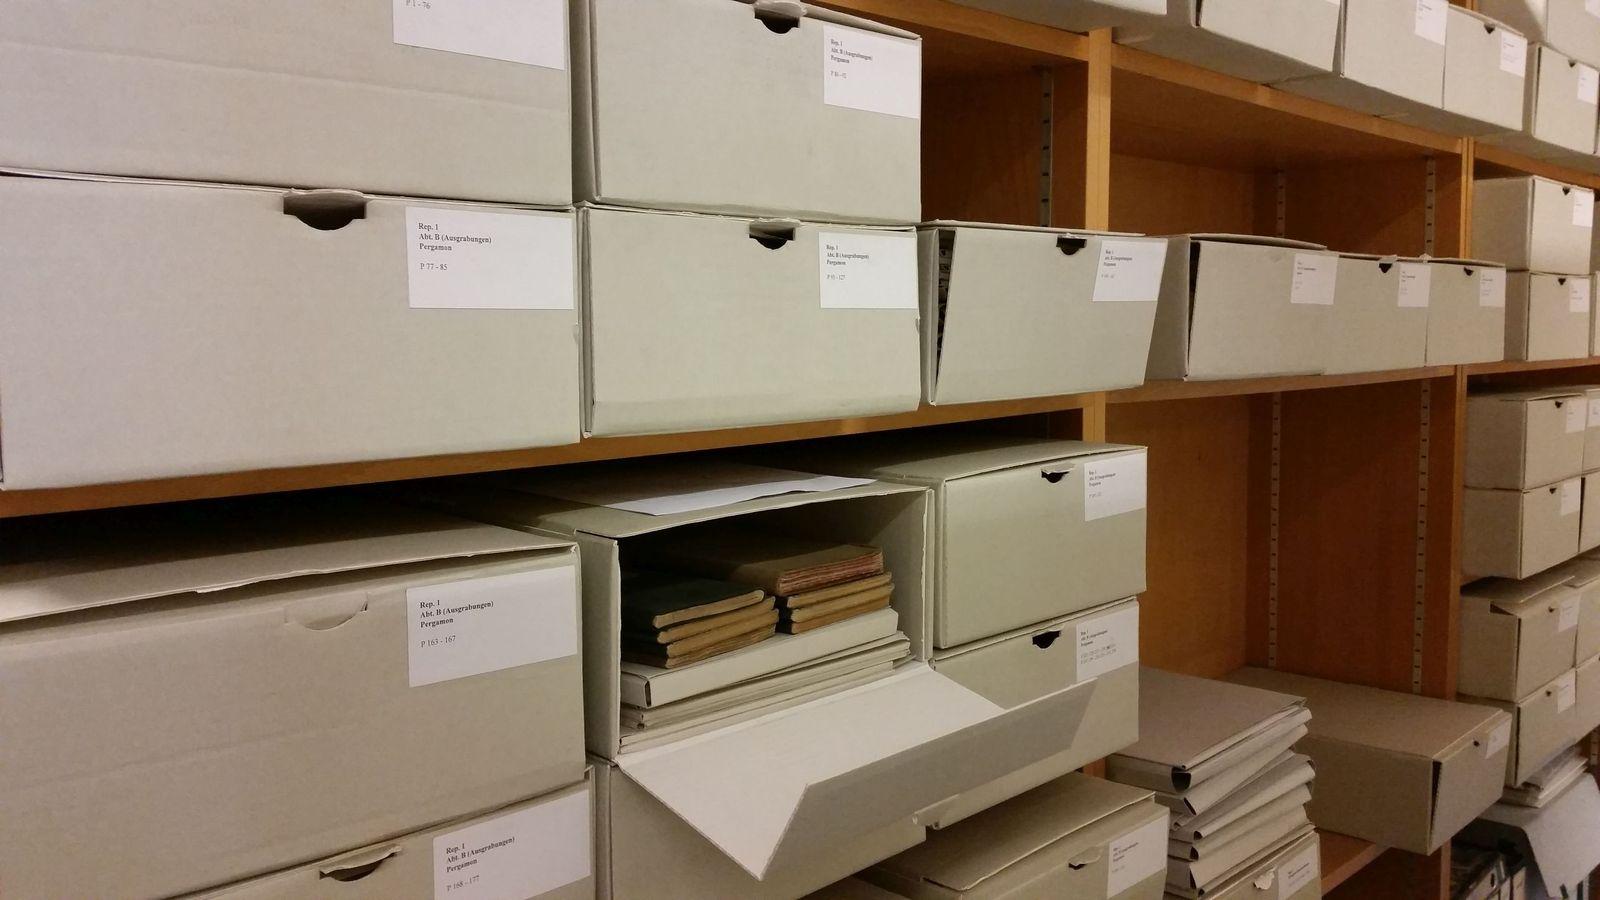 Boxen im Archivraum. Foto Petra Wodtke